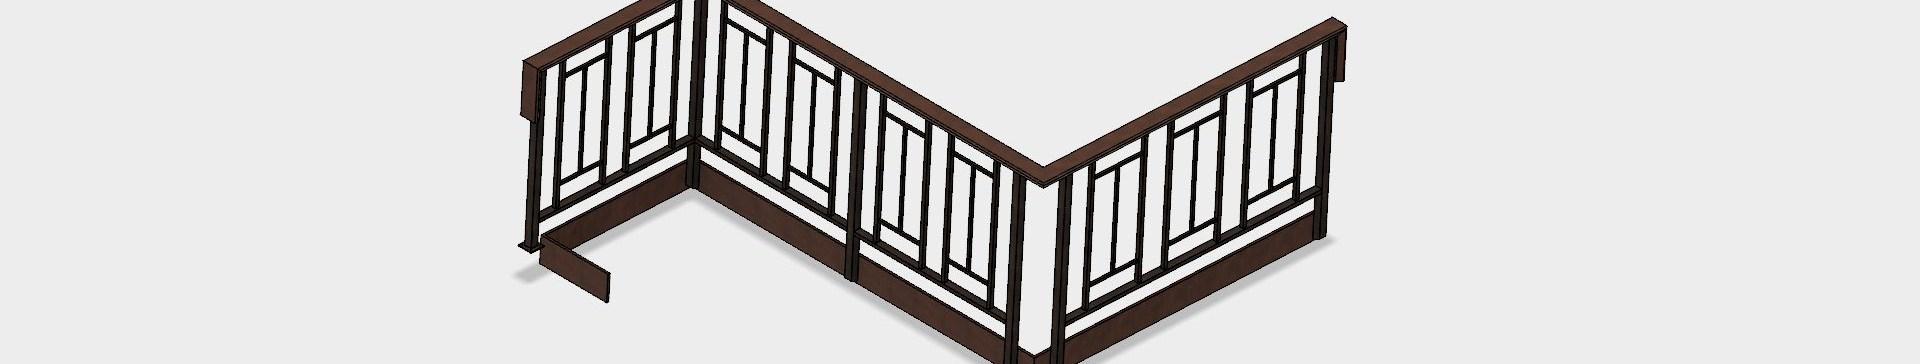 Mid Century Modern Railing Autodesk Online Gallery | Mid Century Modern Handrail | Cantilevered Spiral Stair | Art Deco | Modern Walnut | Tree Branch | Railing